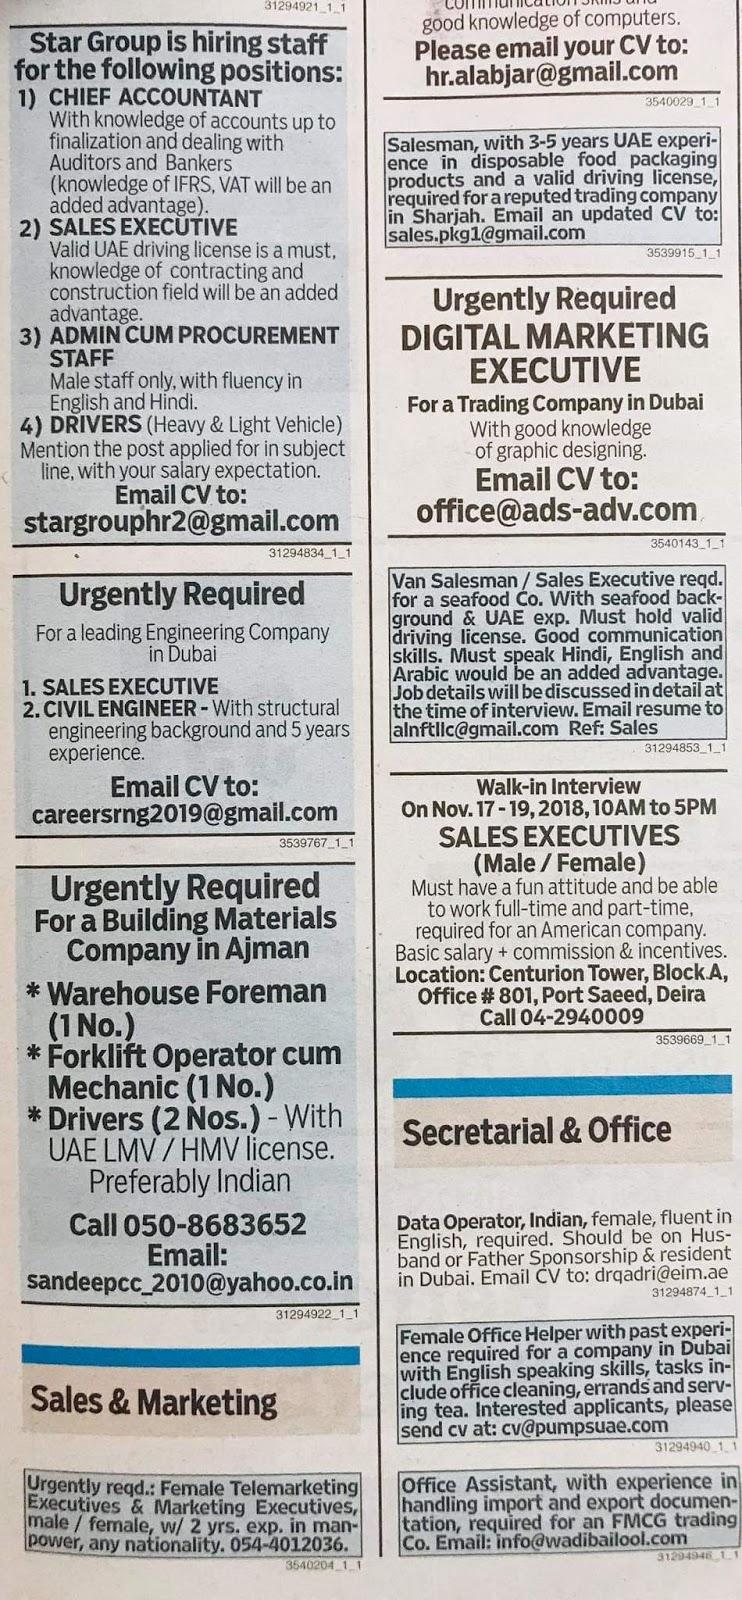 JOBS In UAE Local Hiring Khaleej Times-UAE-1811923- Jobs in